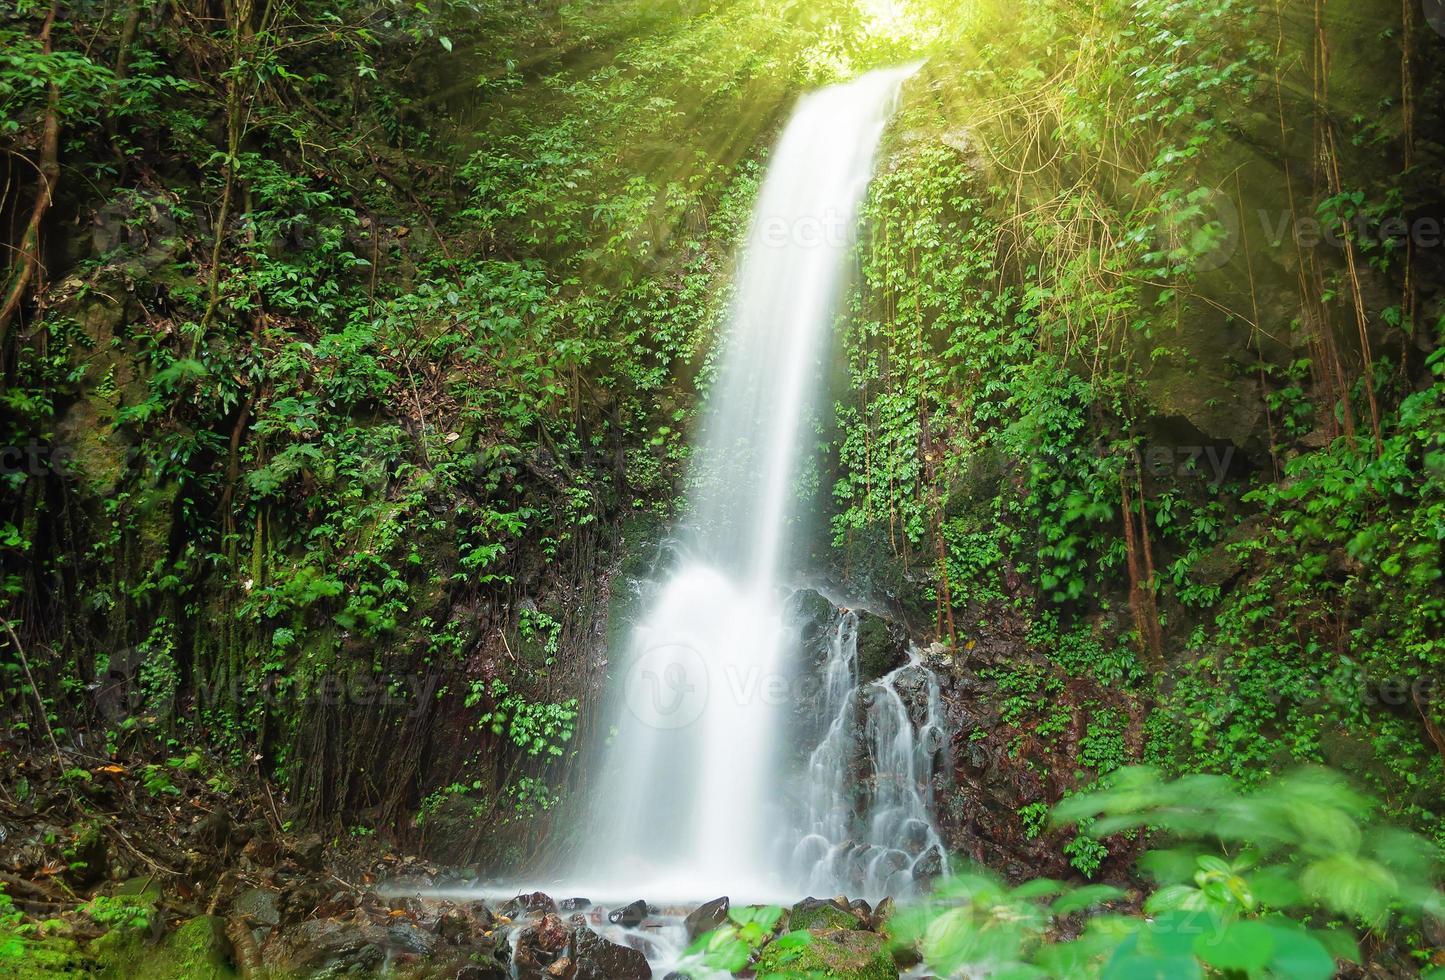 kleine waterval in de jungle foto